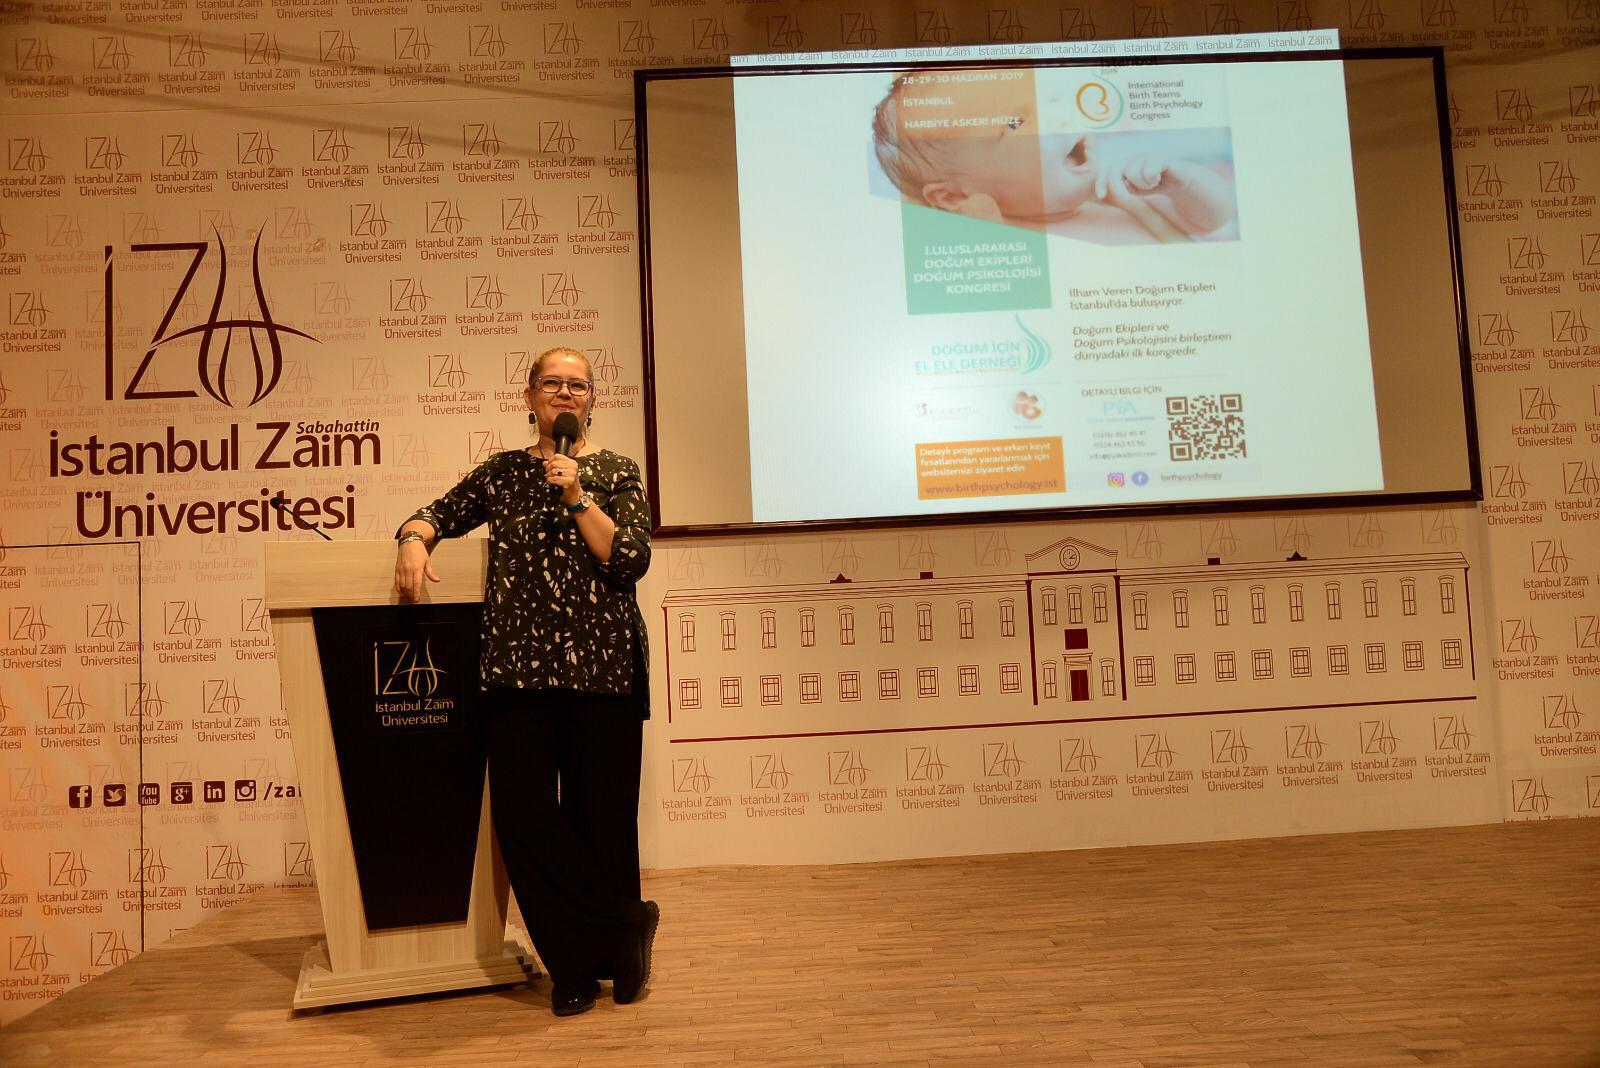 İstanbul Zaim Üni. Doğum Psikolojisi Konferansı